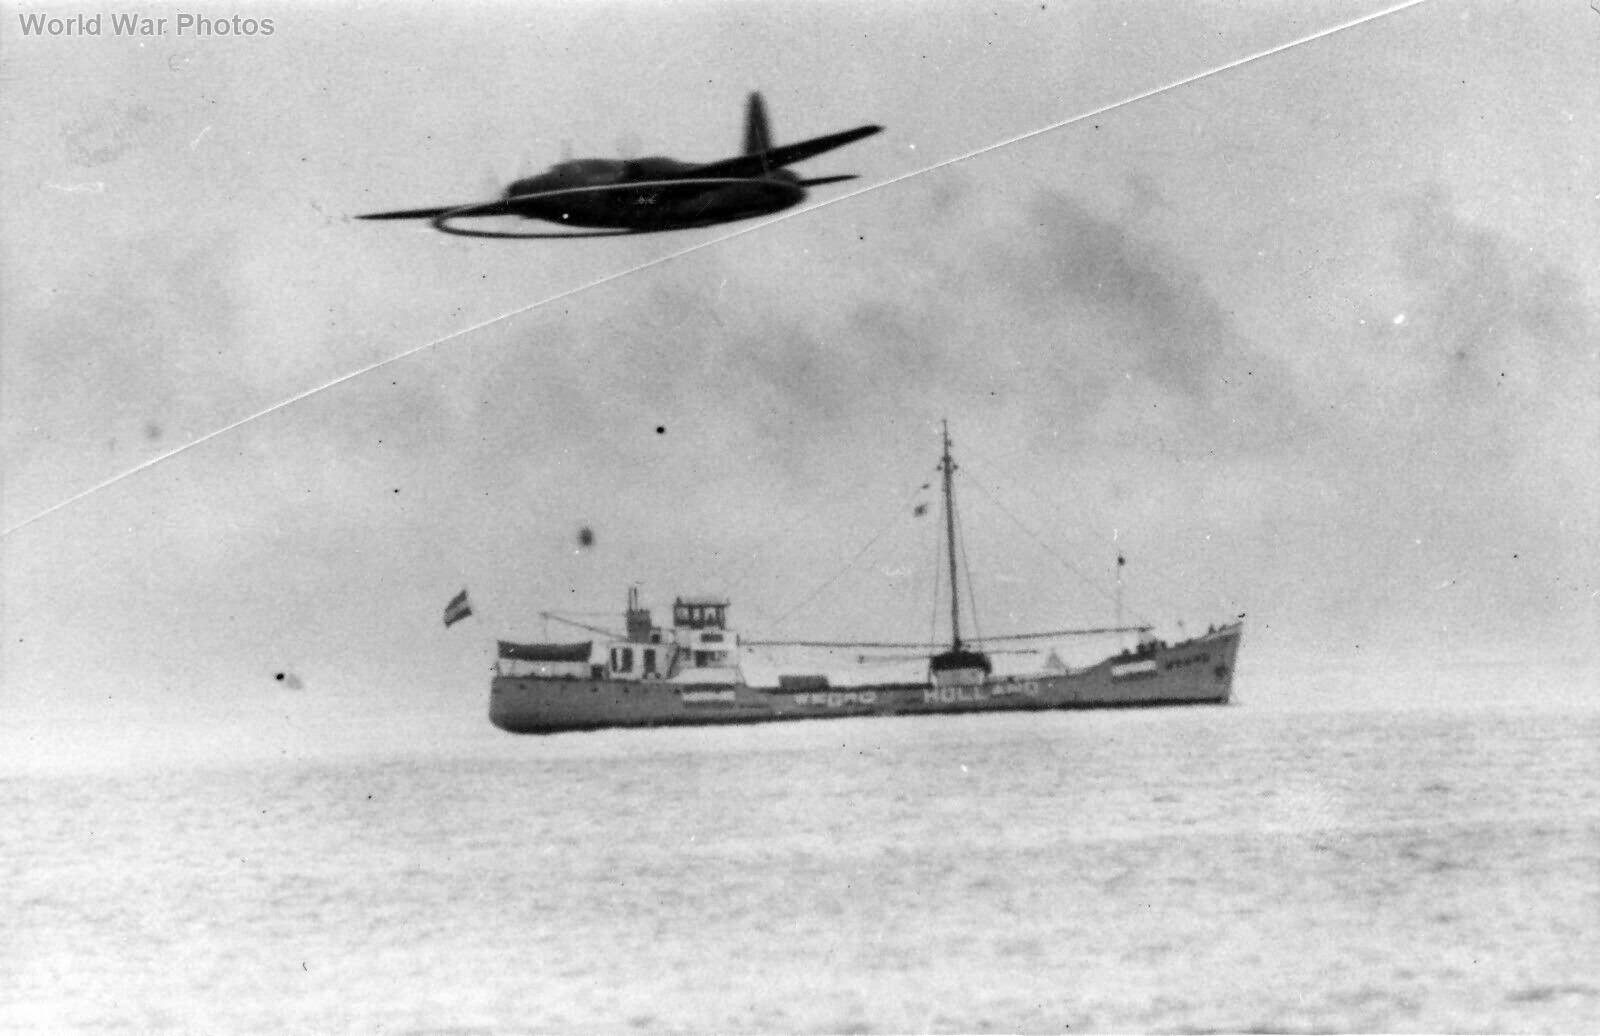 Vickers Wellington DWI minesweeper